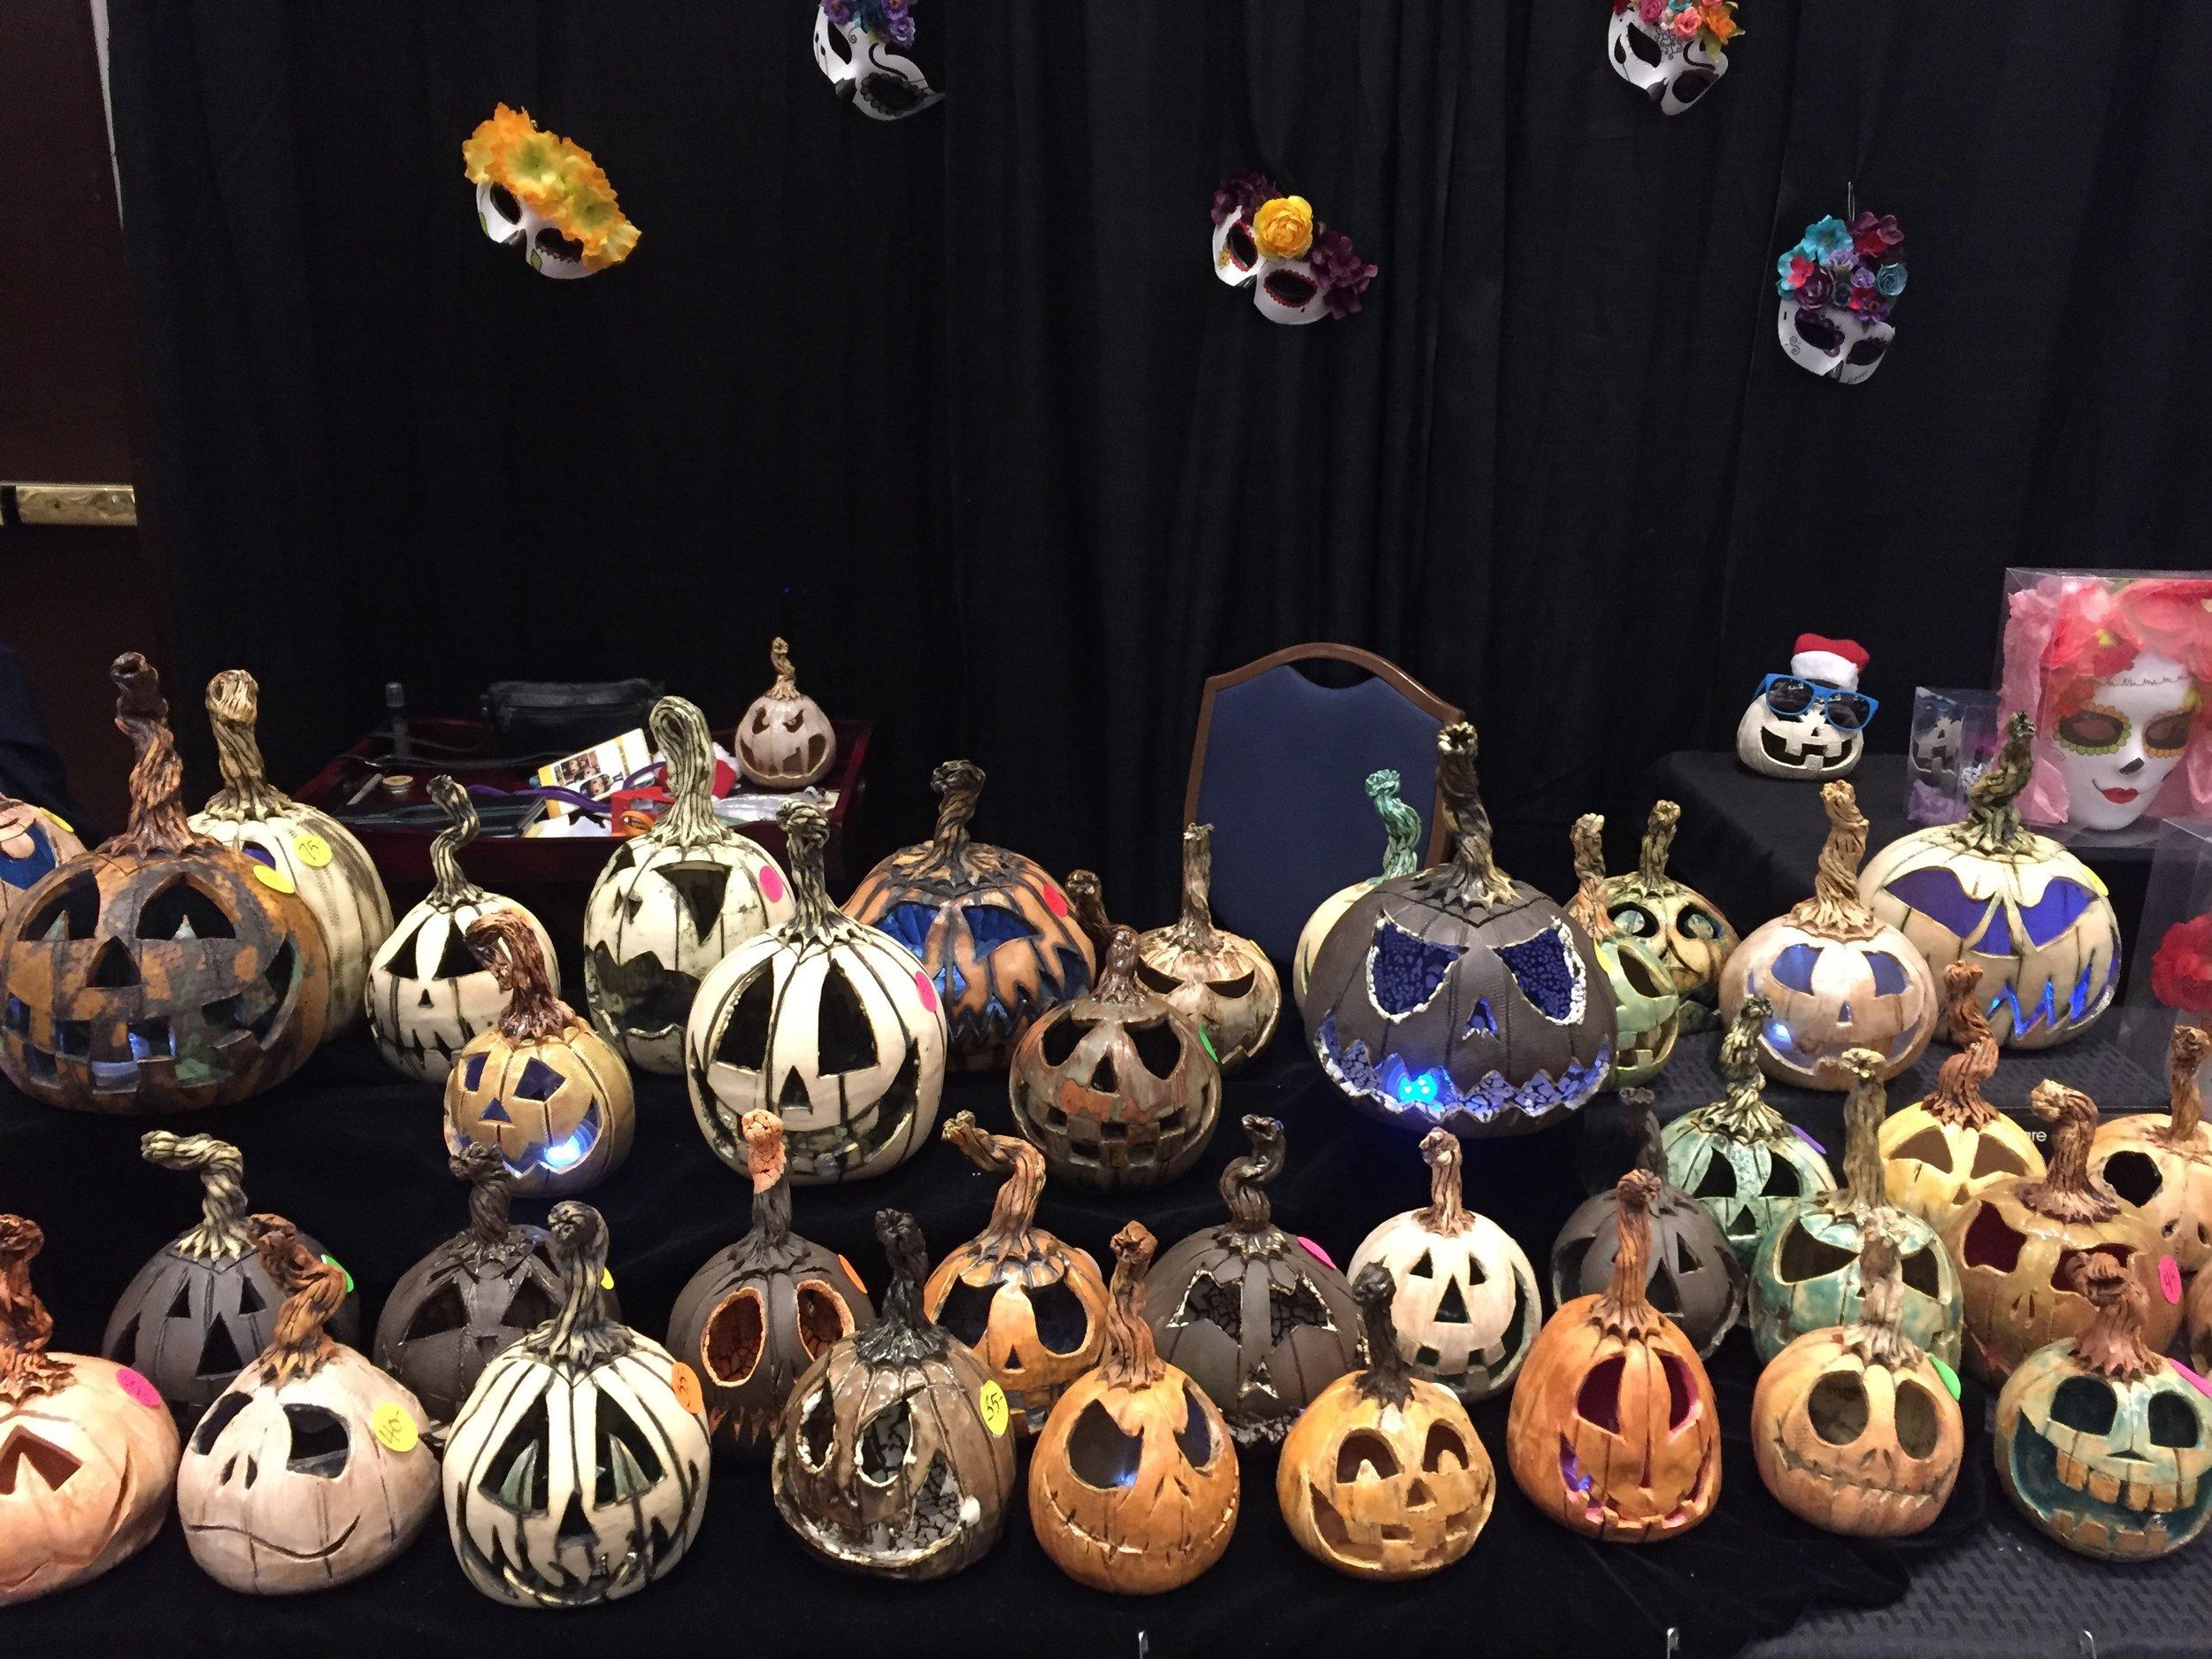 Handmade Jack 'O Lanterns from clay artist Cathy Galgano. On the  facebook @CathysJacks.